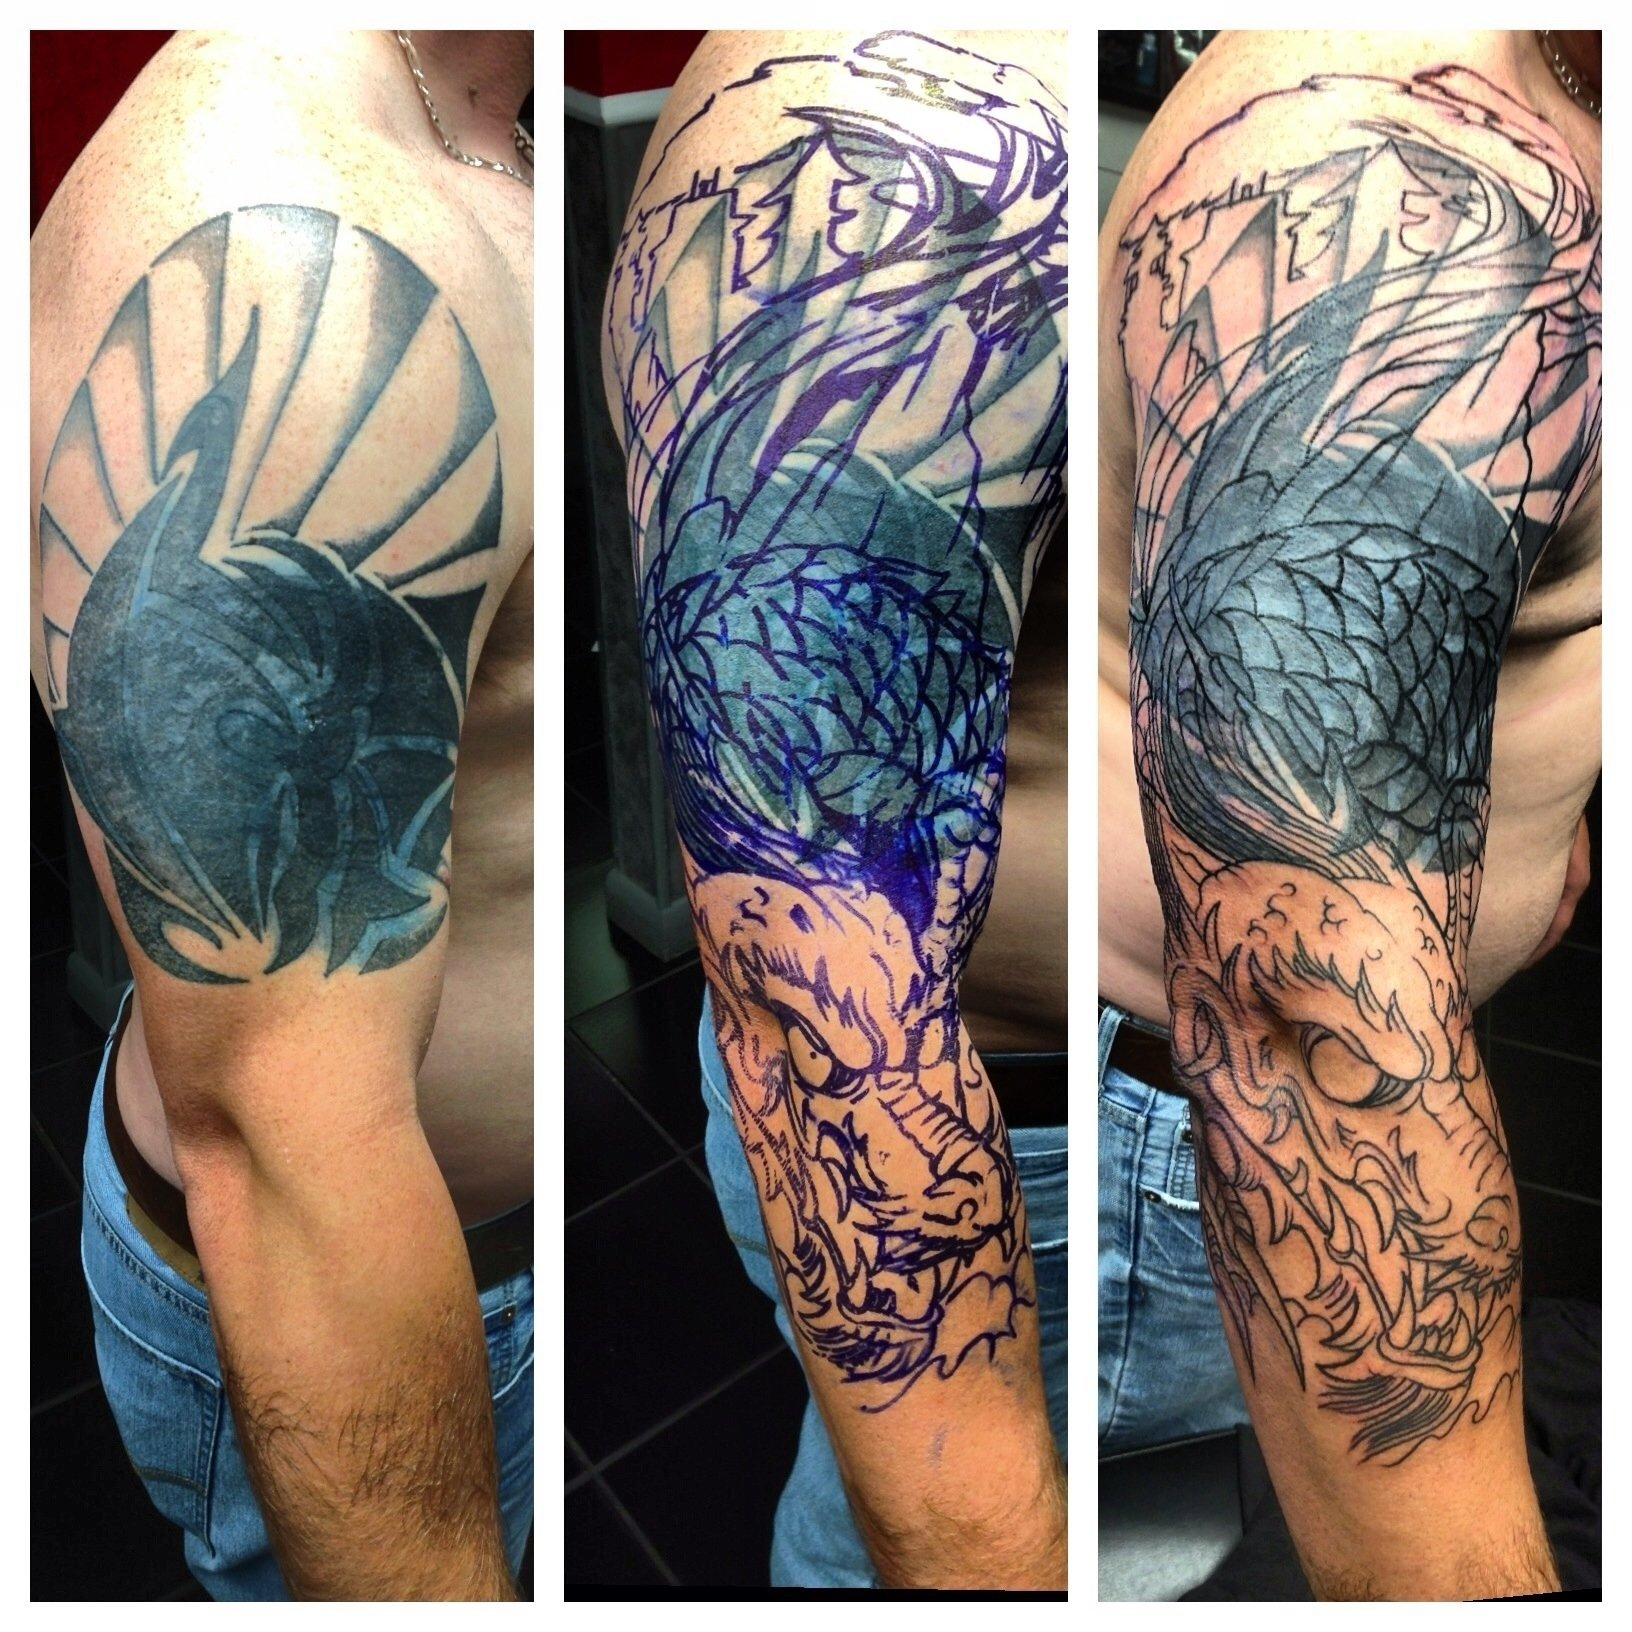 10 Fabulous Black Tattoo Cover Up Ideas tribal dragon tattoo designs tattoo ideas pictures tattoo ideas 3 2020